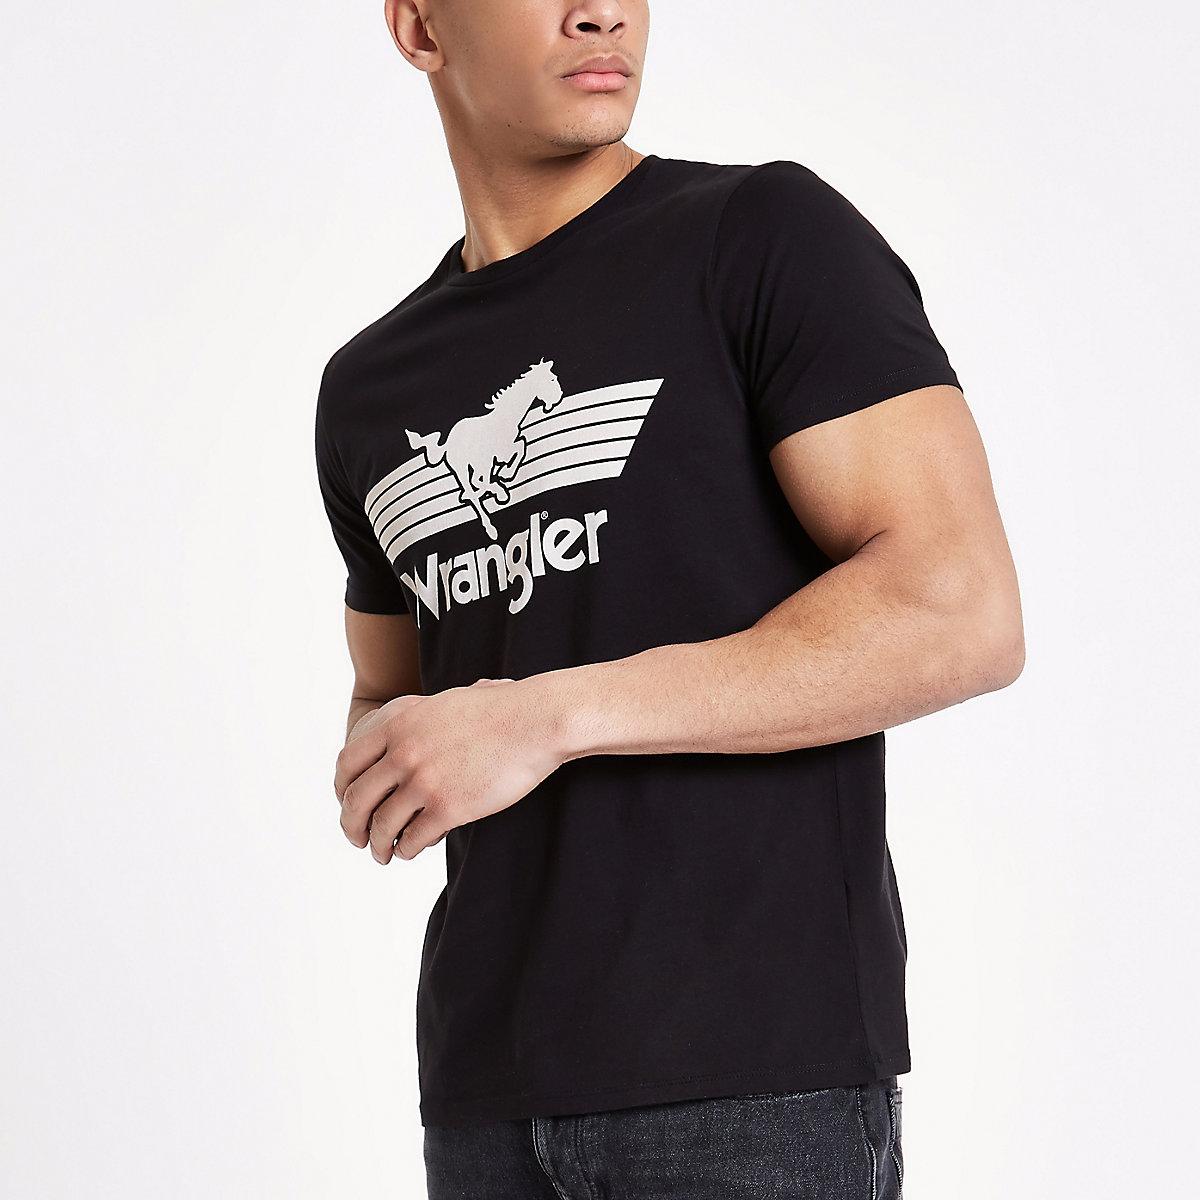 Wrangler black graphic logo print T-shirt